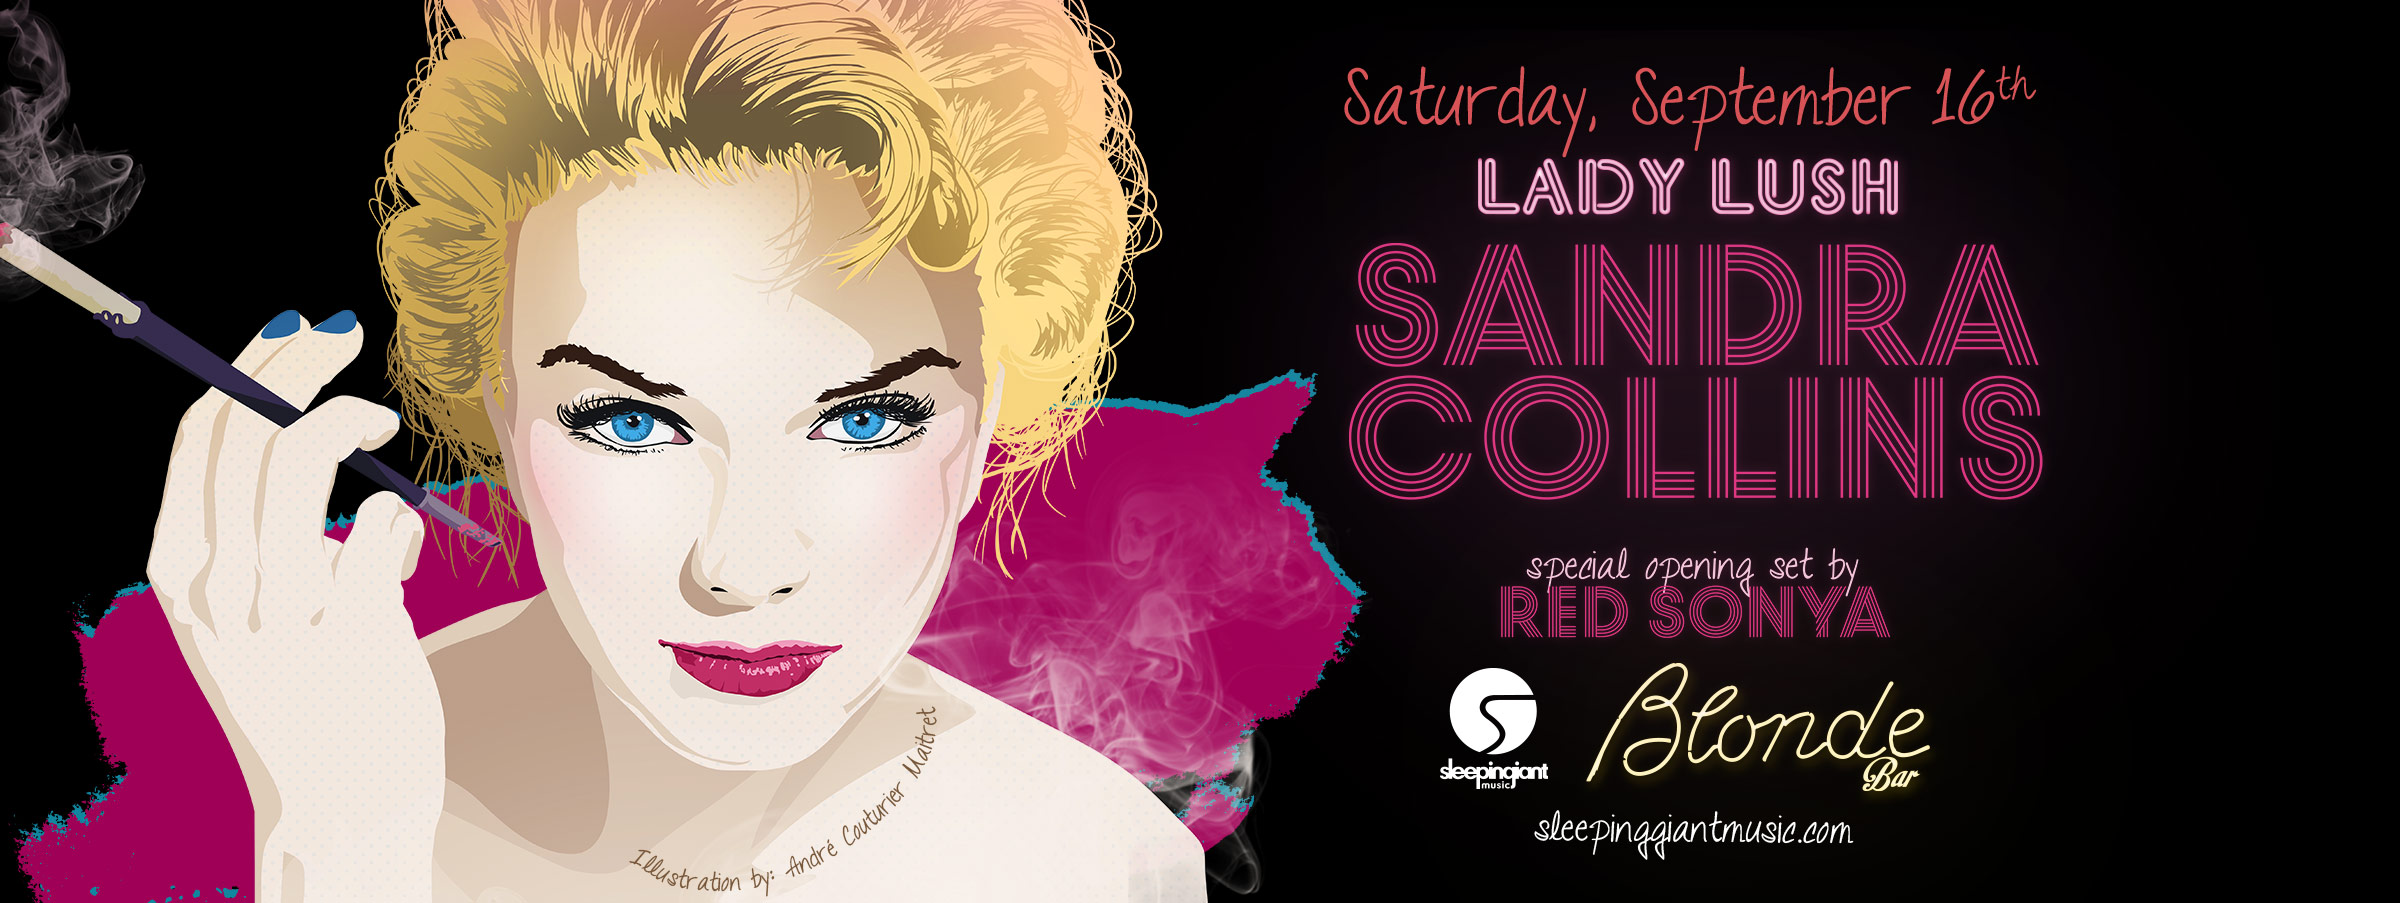 Lady Lush feat. Sandra Collins